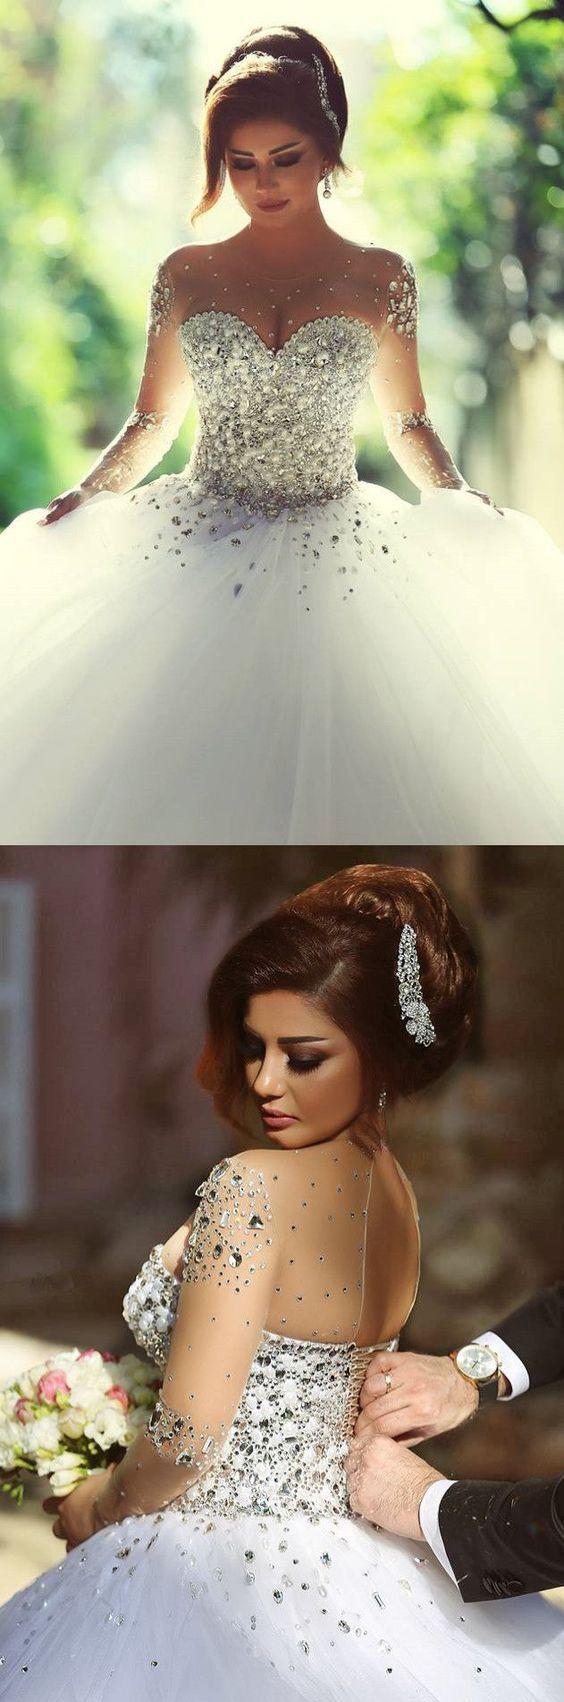 Wedding Dress,Wedding Dresses,Long Sleeve Crystal Ball Gown Wedding Dress,White Bridal Dresses